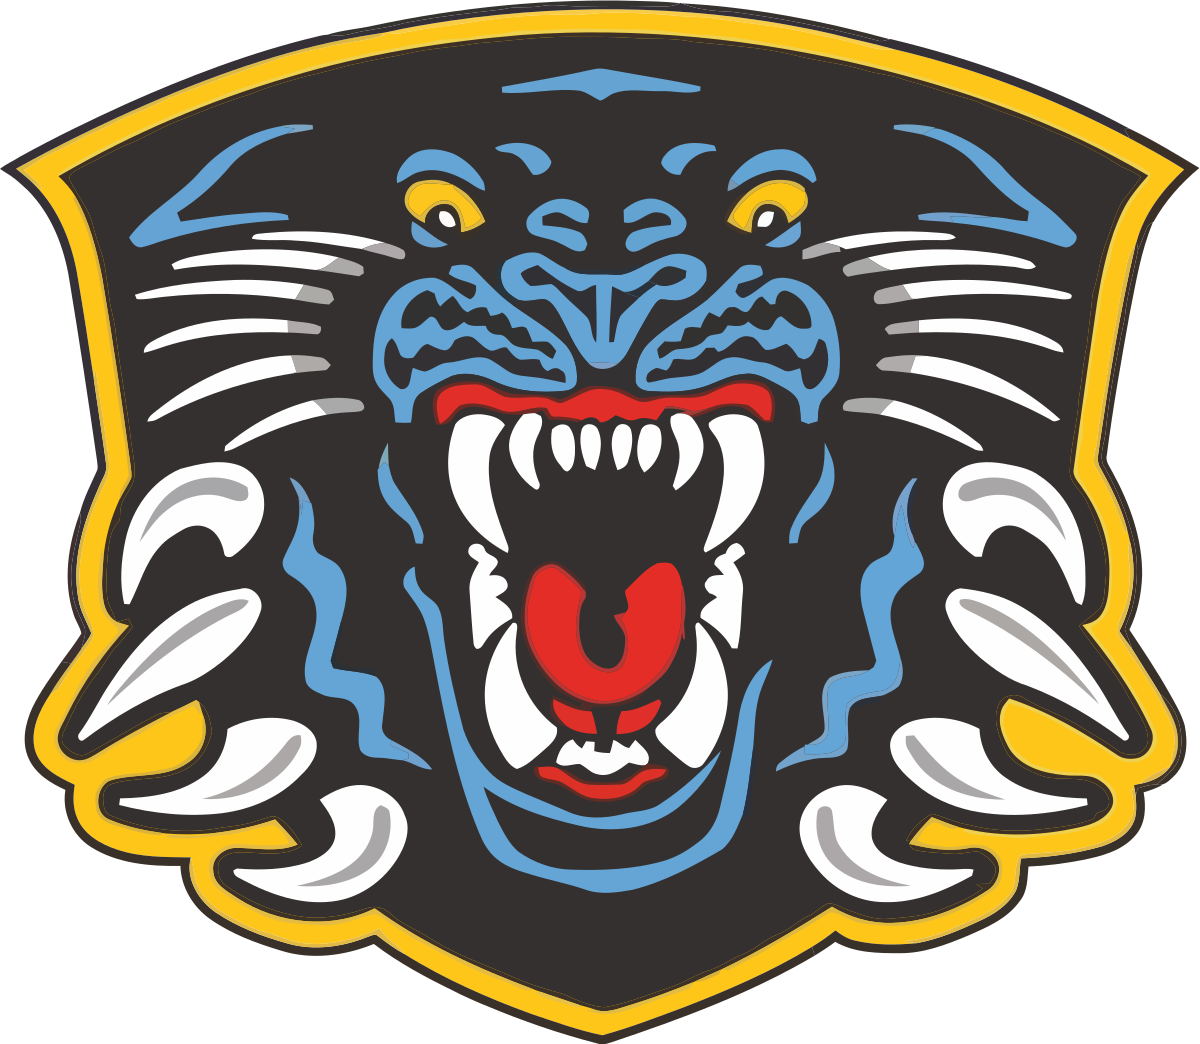 Football yeti clipart clipart transparent Nottingham Panthers - Wikipedia clipart transparent